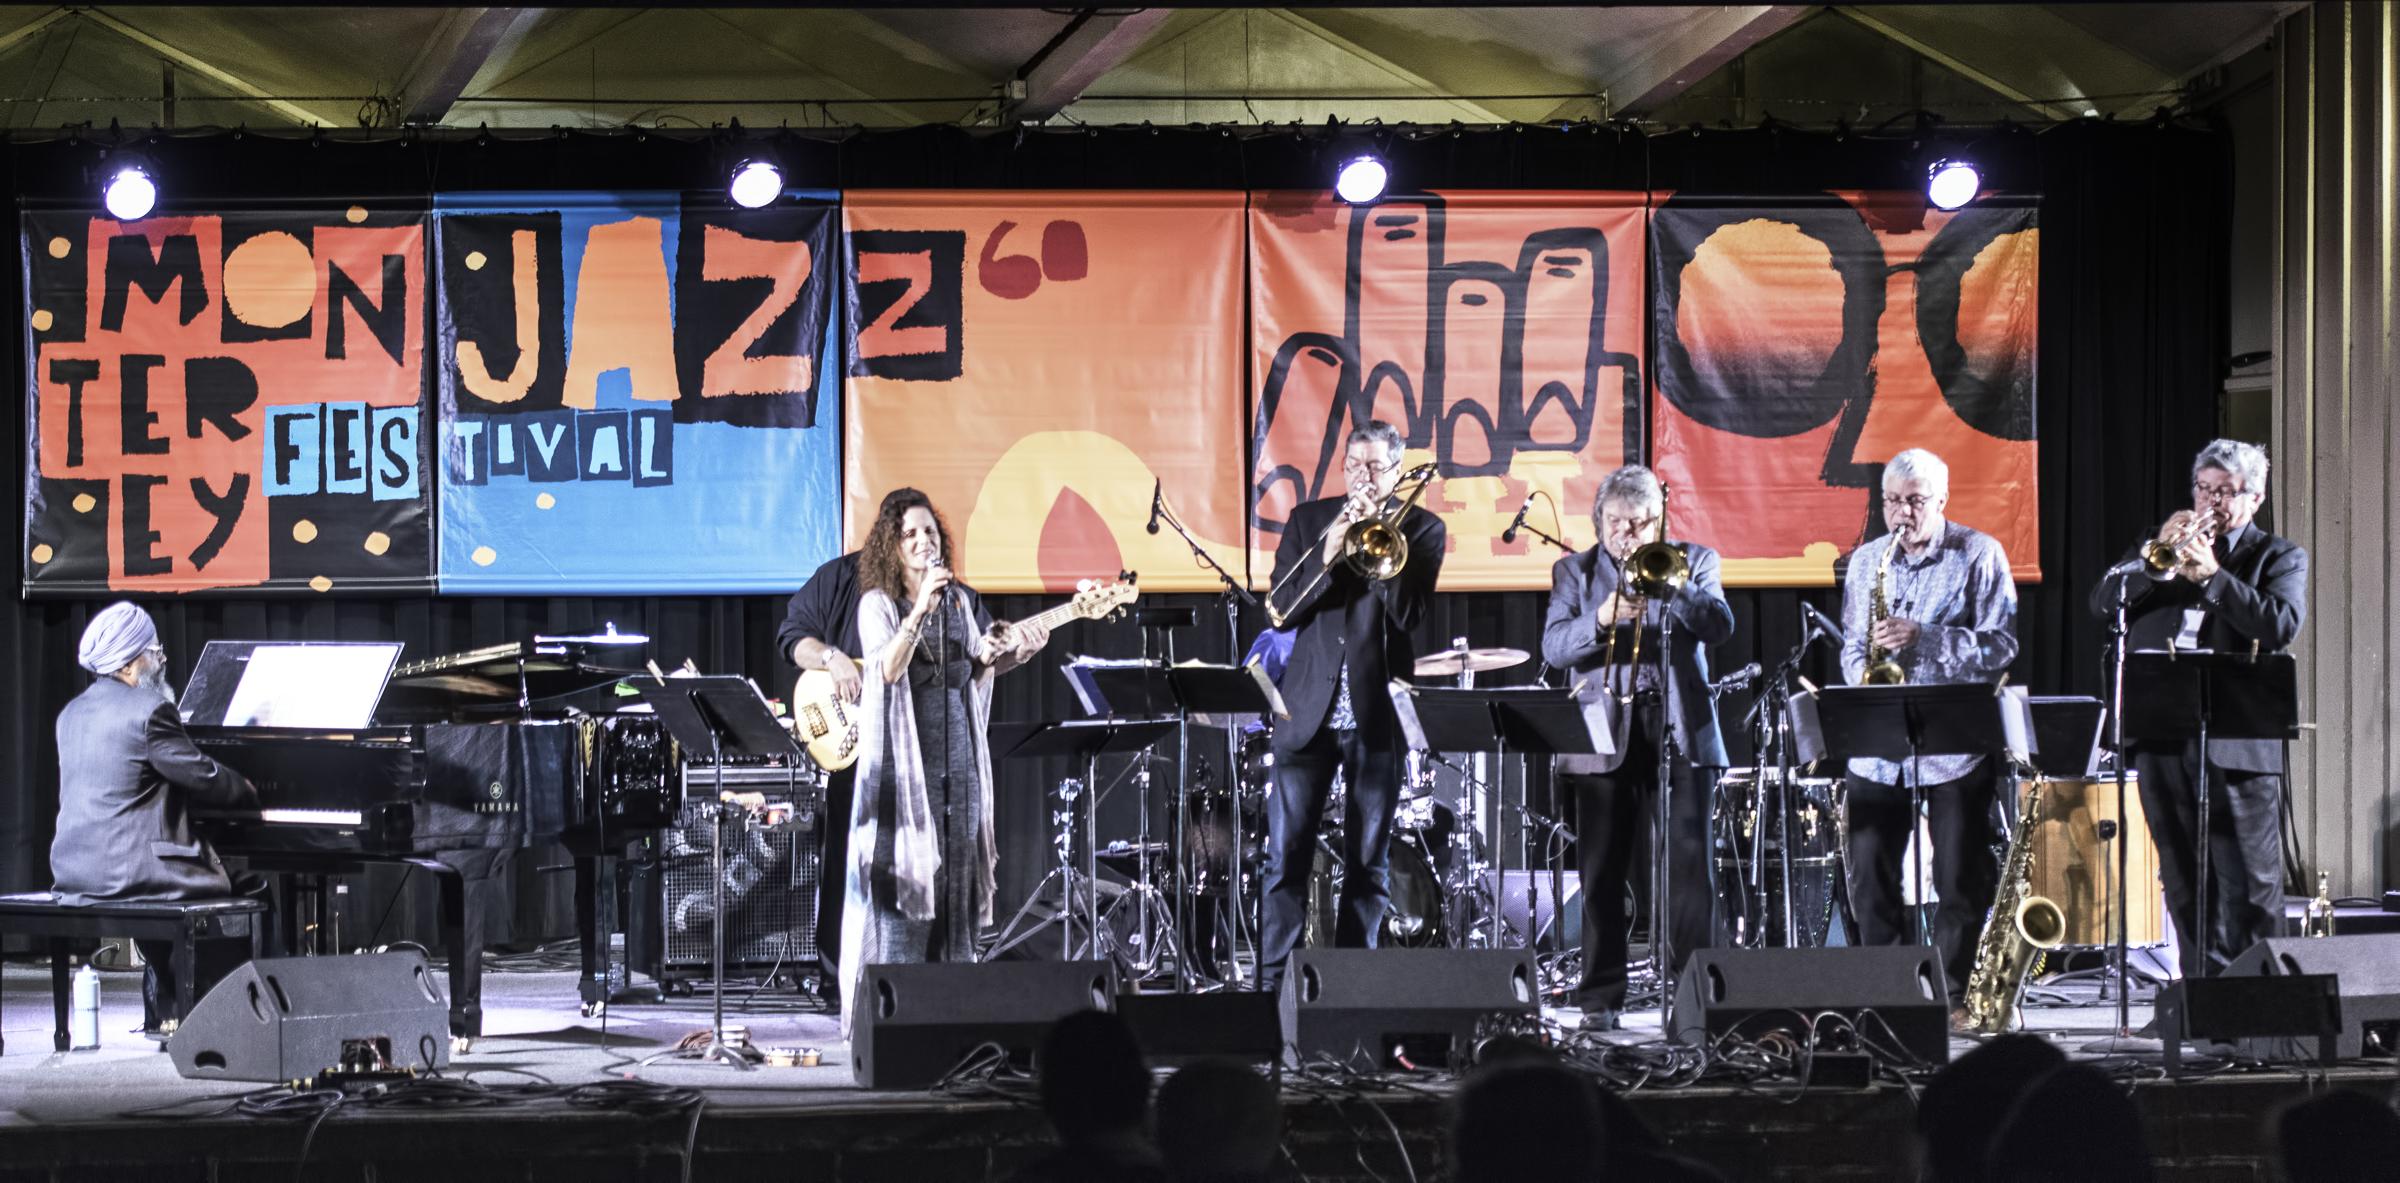 Jasnam Daya Singh, Sandy Cressman,  Jeff Cressman, Rodger Fox, Harvey Weinapel and Jon Papenbrook with Sandy Cressman Entre Amigos at the Monterey Jazz Festival